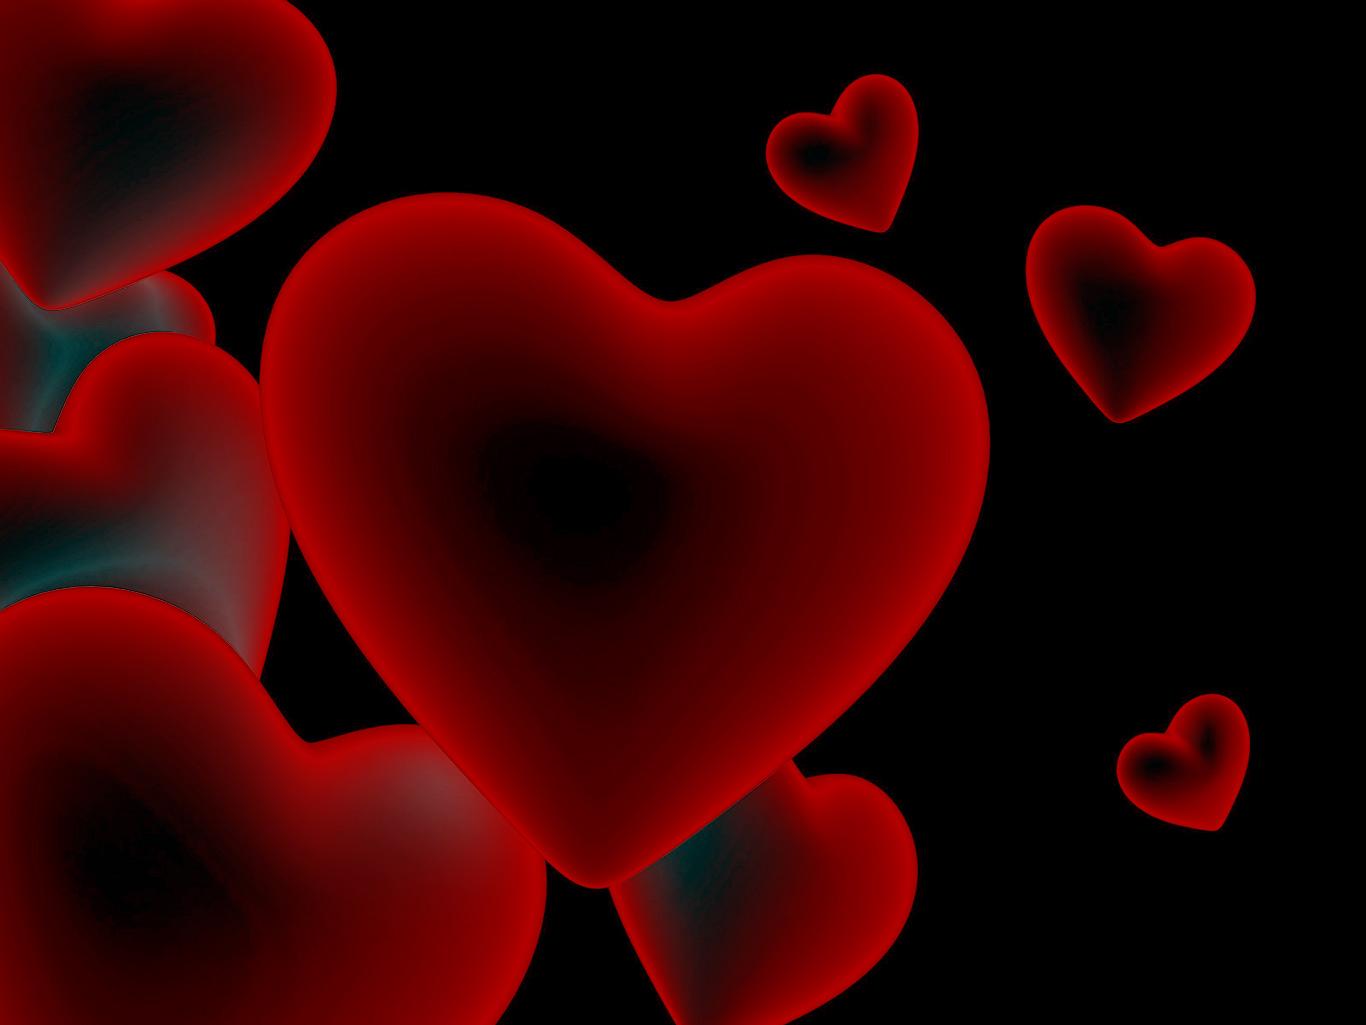 Love Background Wallpaper 1366x1025 Download Hd Wallpaper Wallpapertip